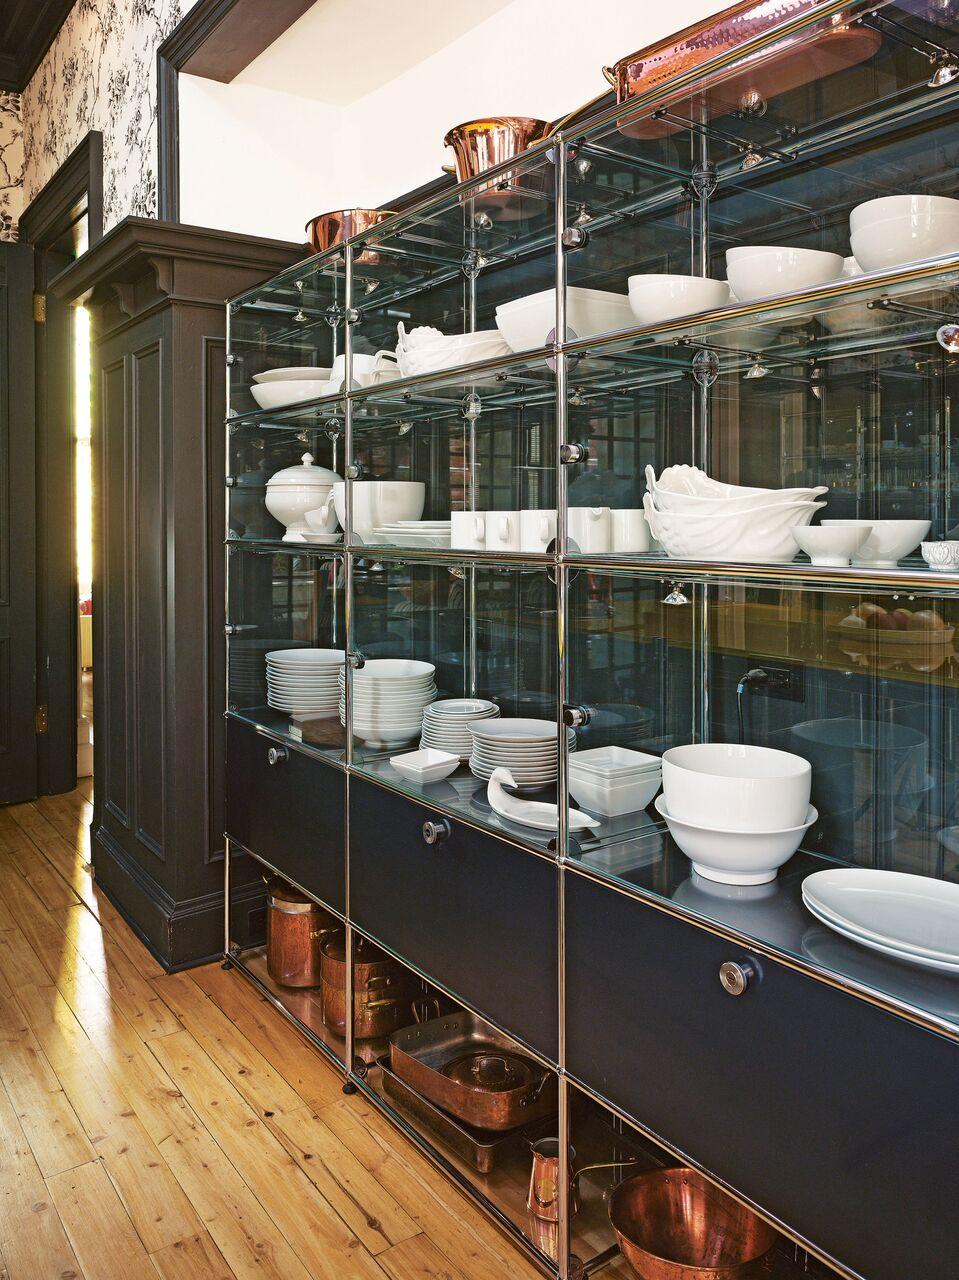 usm haller  the reigning champ of modular furniture